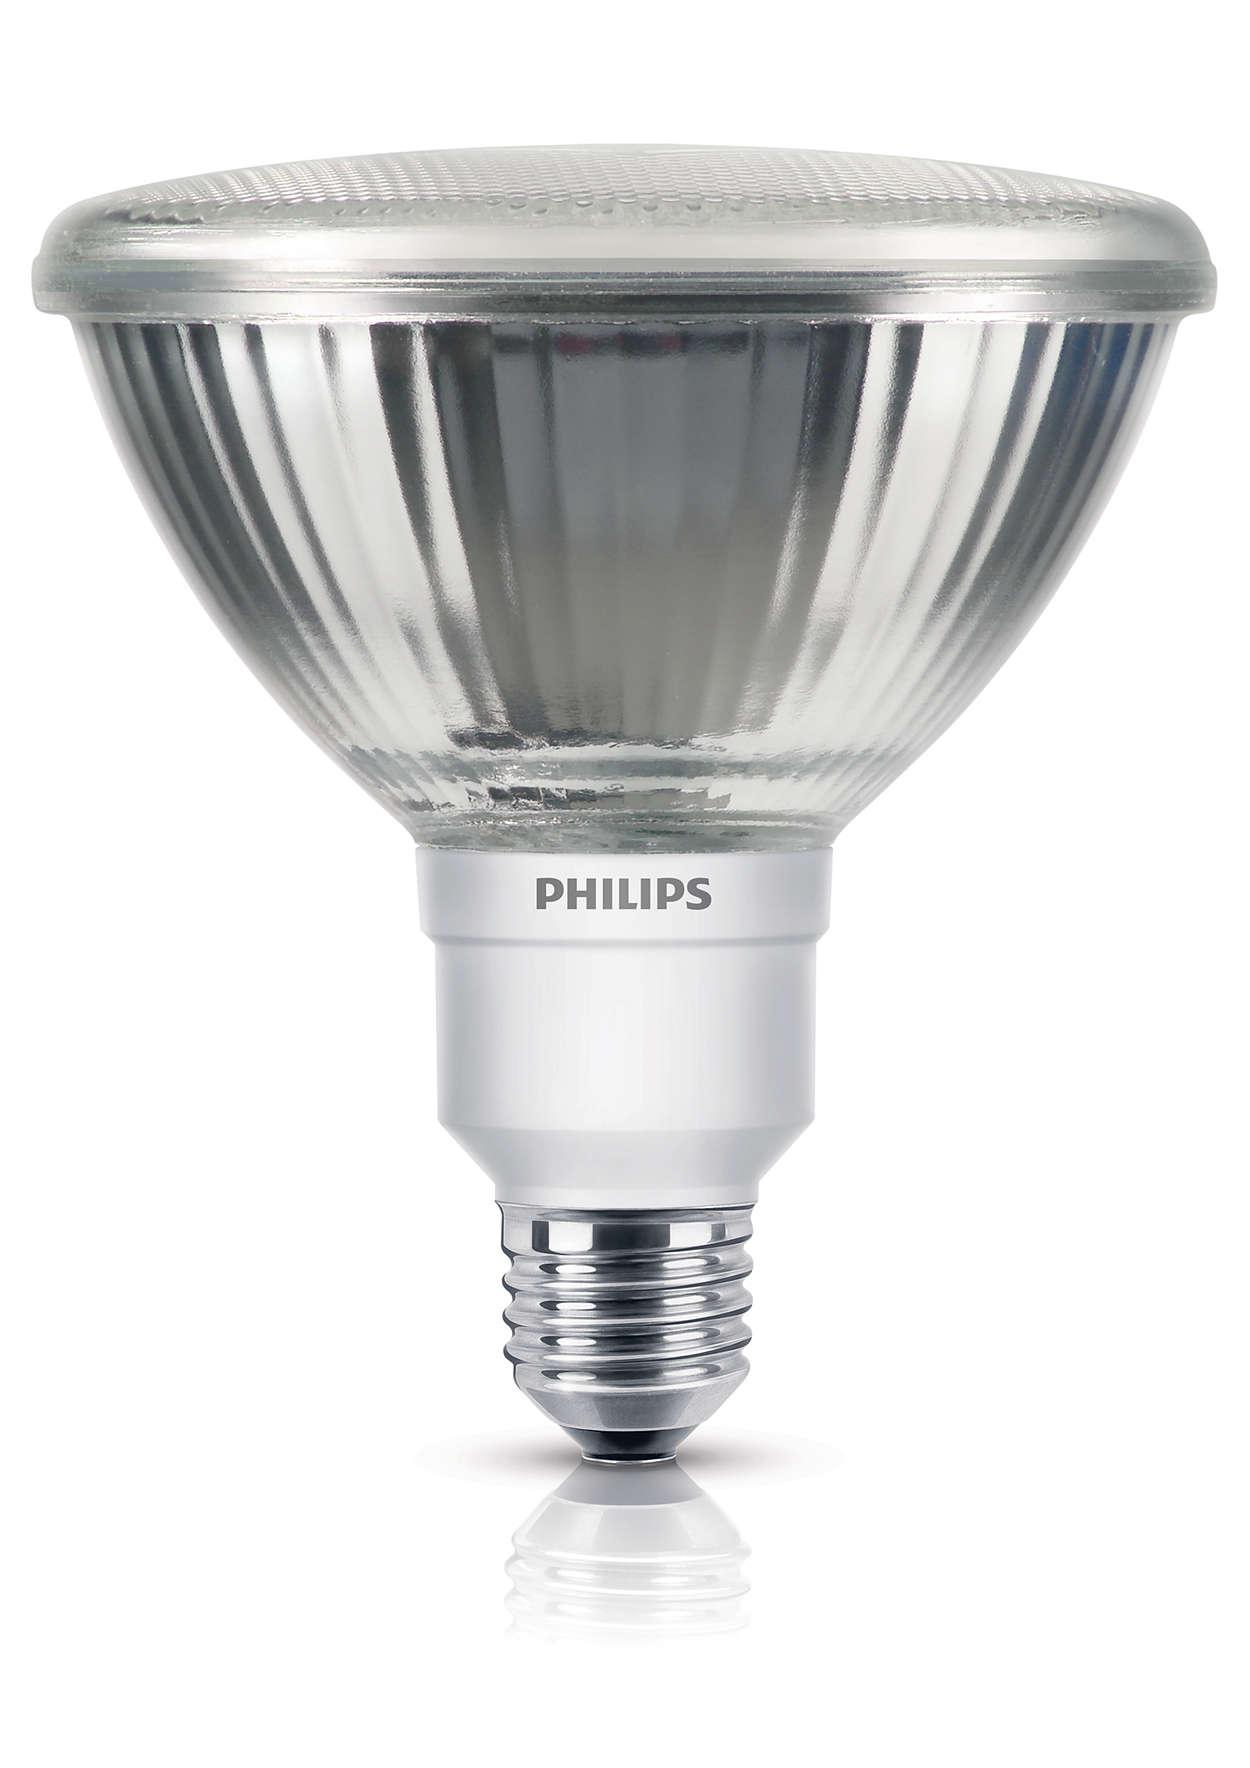 Tecnologia economizadora numa lâmpada direccional